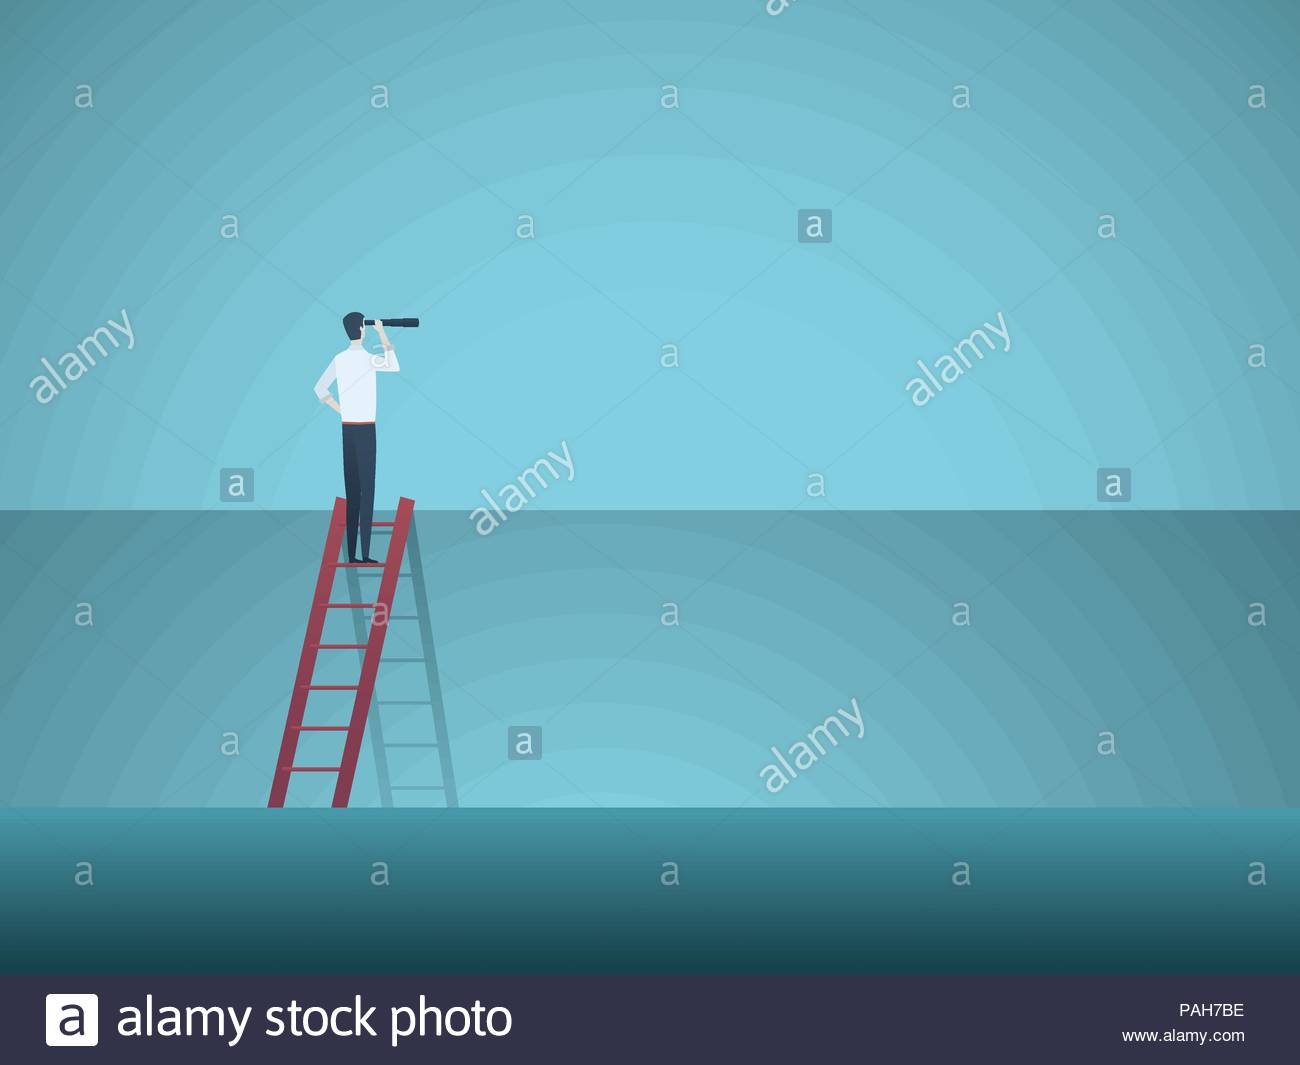 Climbing Motivation Stockfotos & Climbing Motivation Bilder - Seite ...